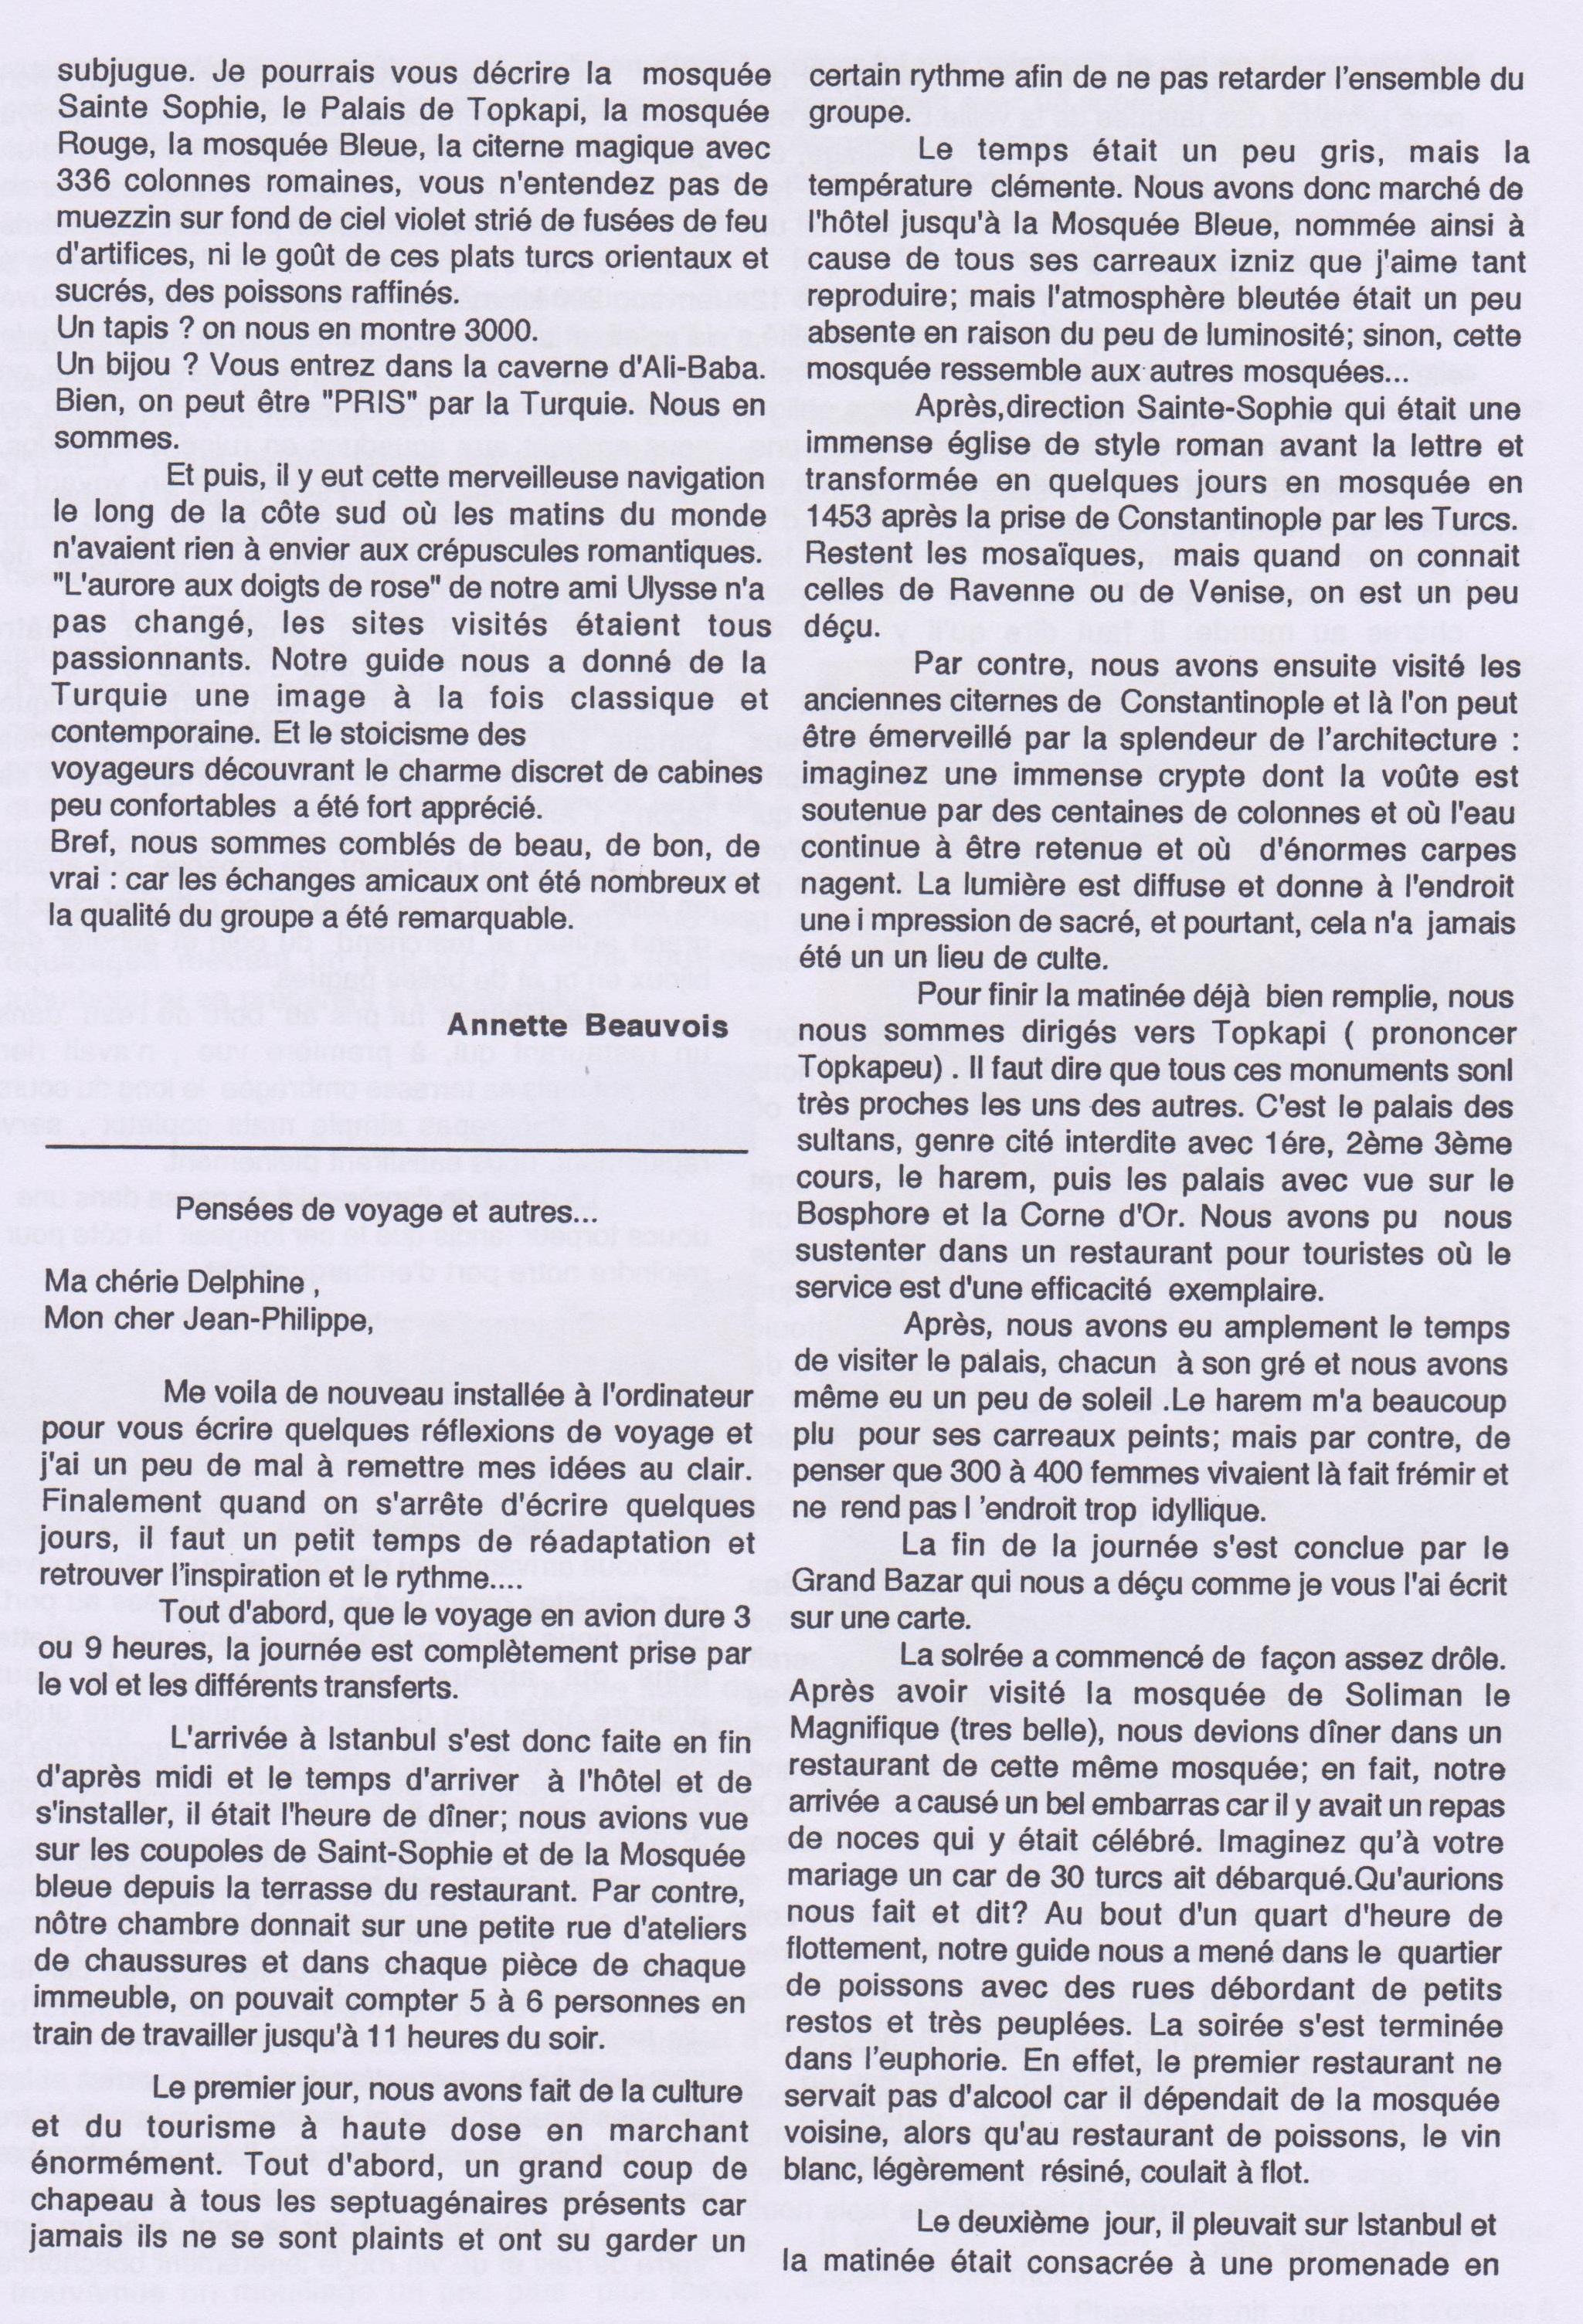 Voyage en Turquie-du 6 au 13 octobre 2000-page2a